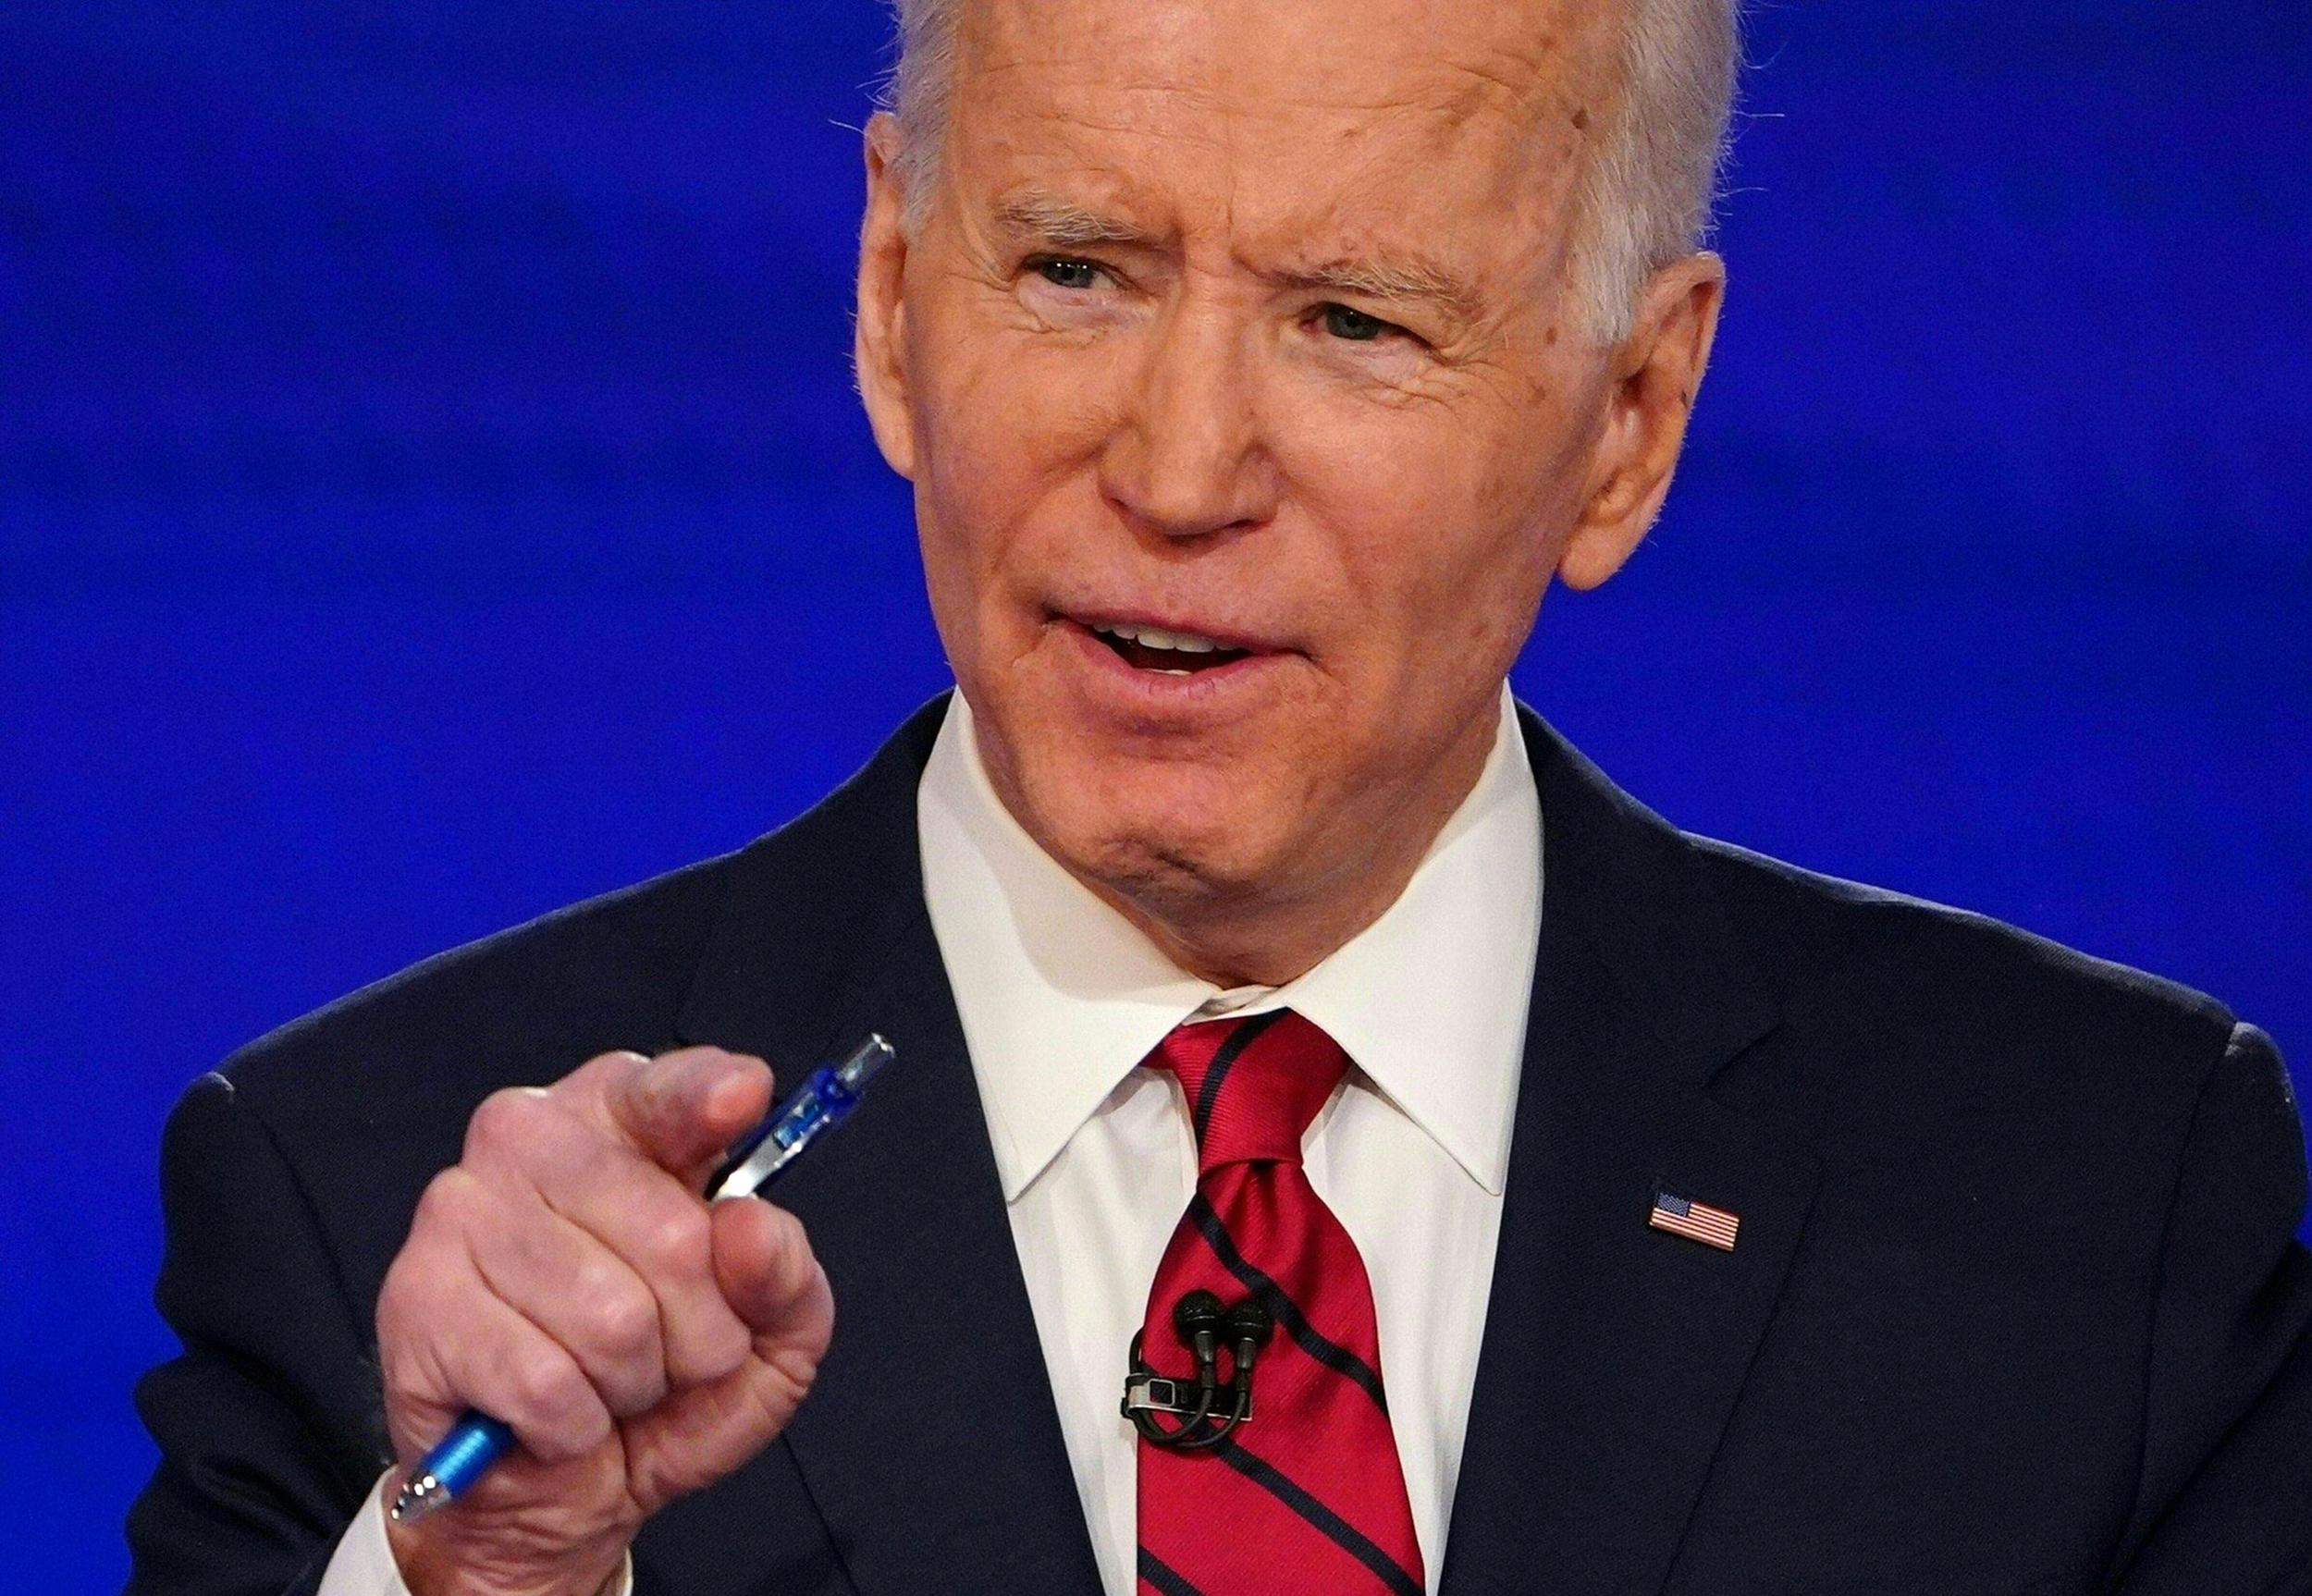 Hasil gambar untuk Biden sweeps three states, doubles delegate lead over Sanders